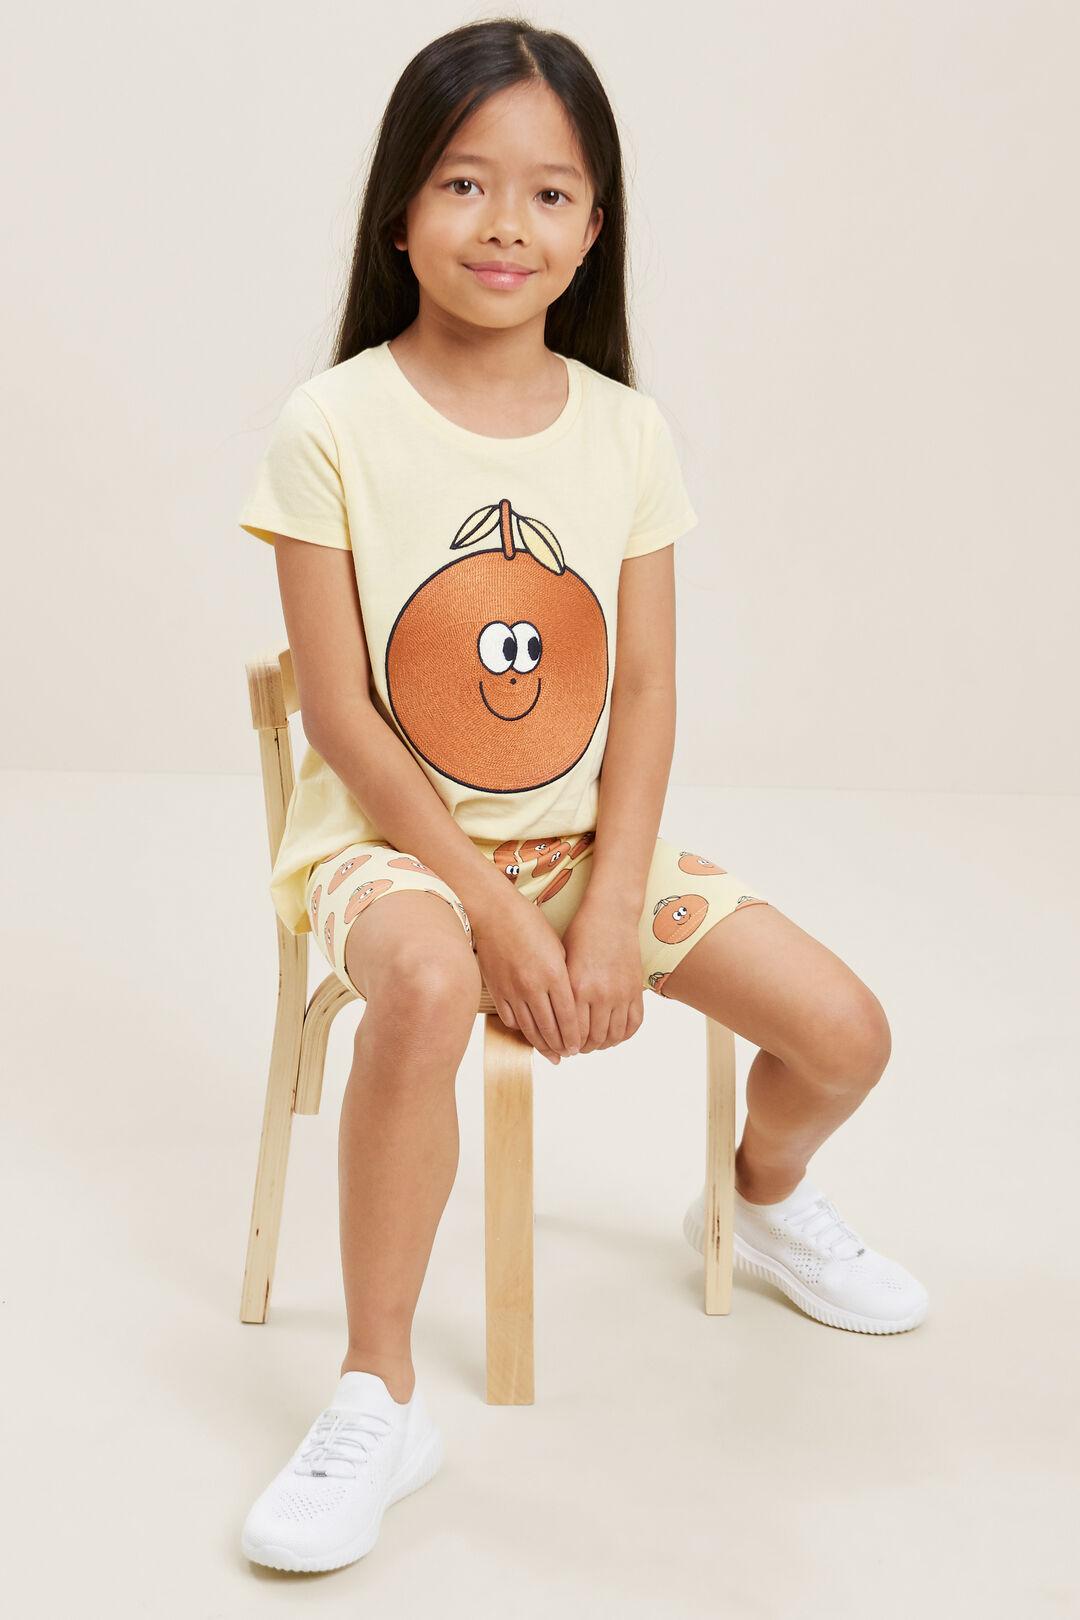 Orange EmbroideredTee  BUTTERCUP  hi-res